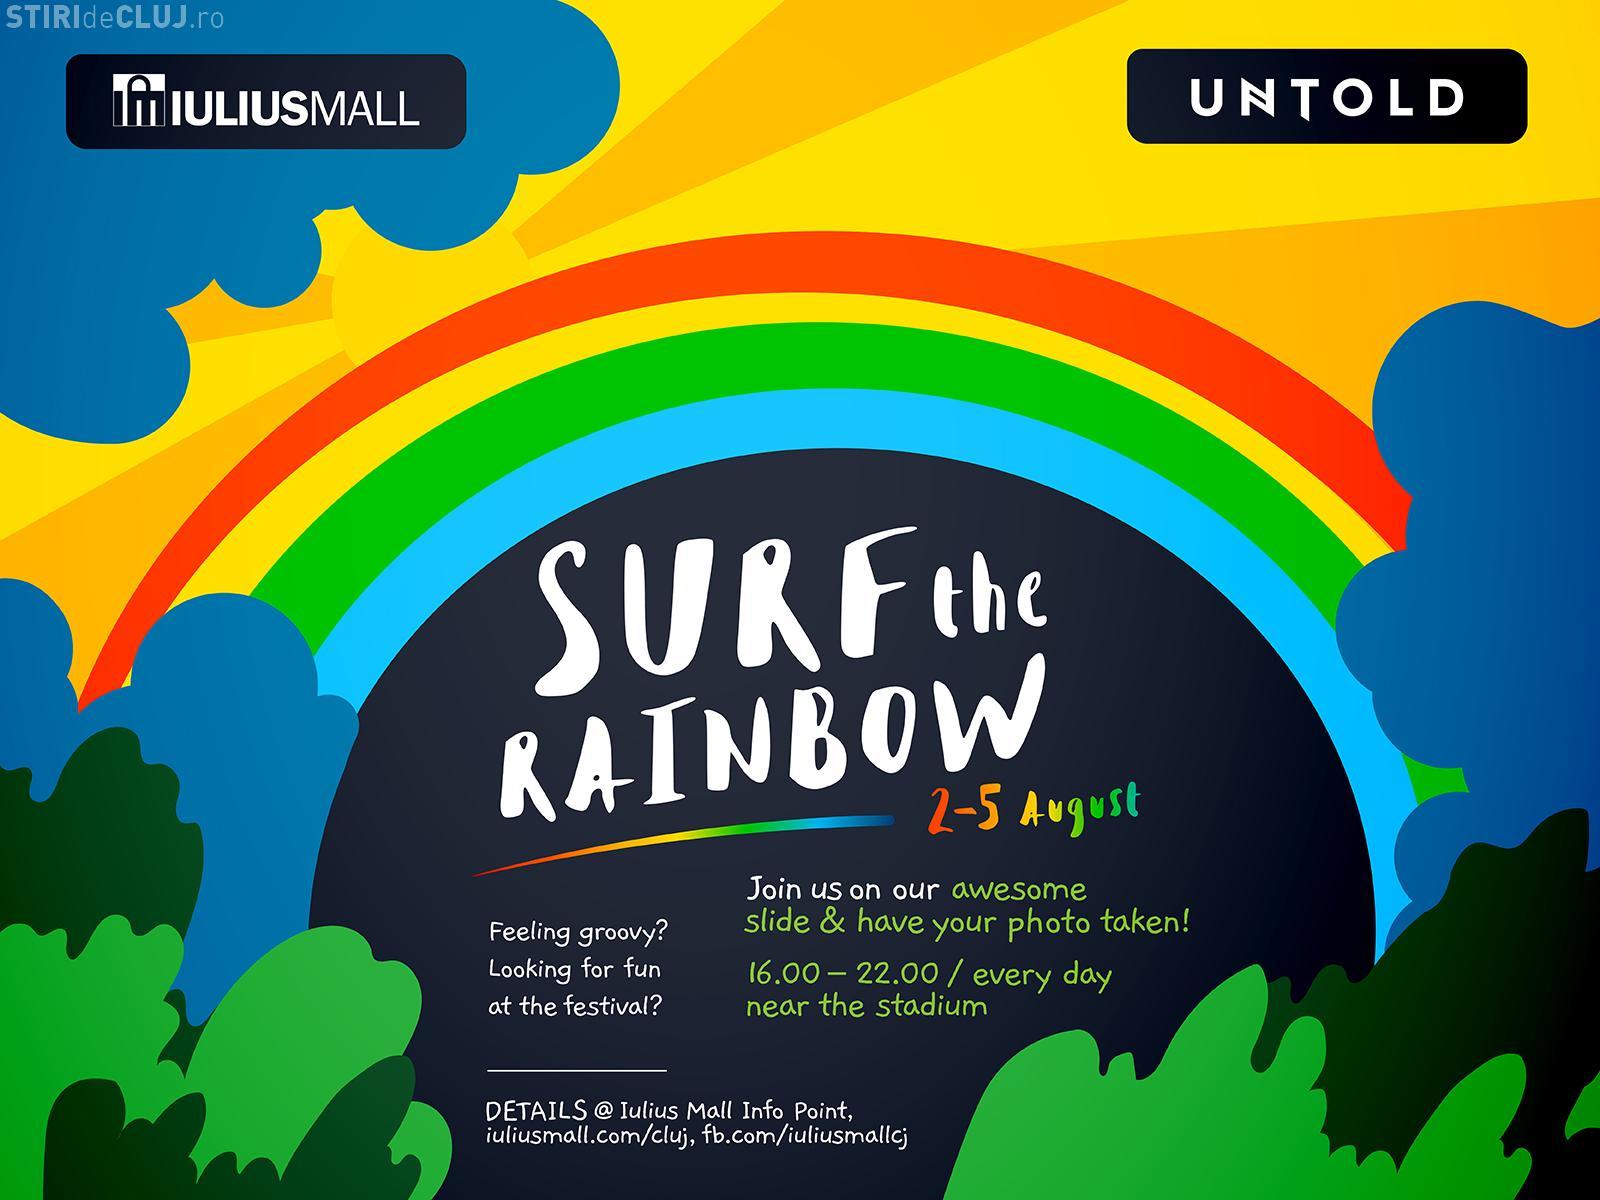 """SURF THE RAINBOW"" - Iulius Mall te invită la o petrecere colorată, la UNTOLD"